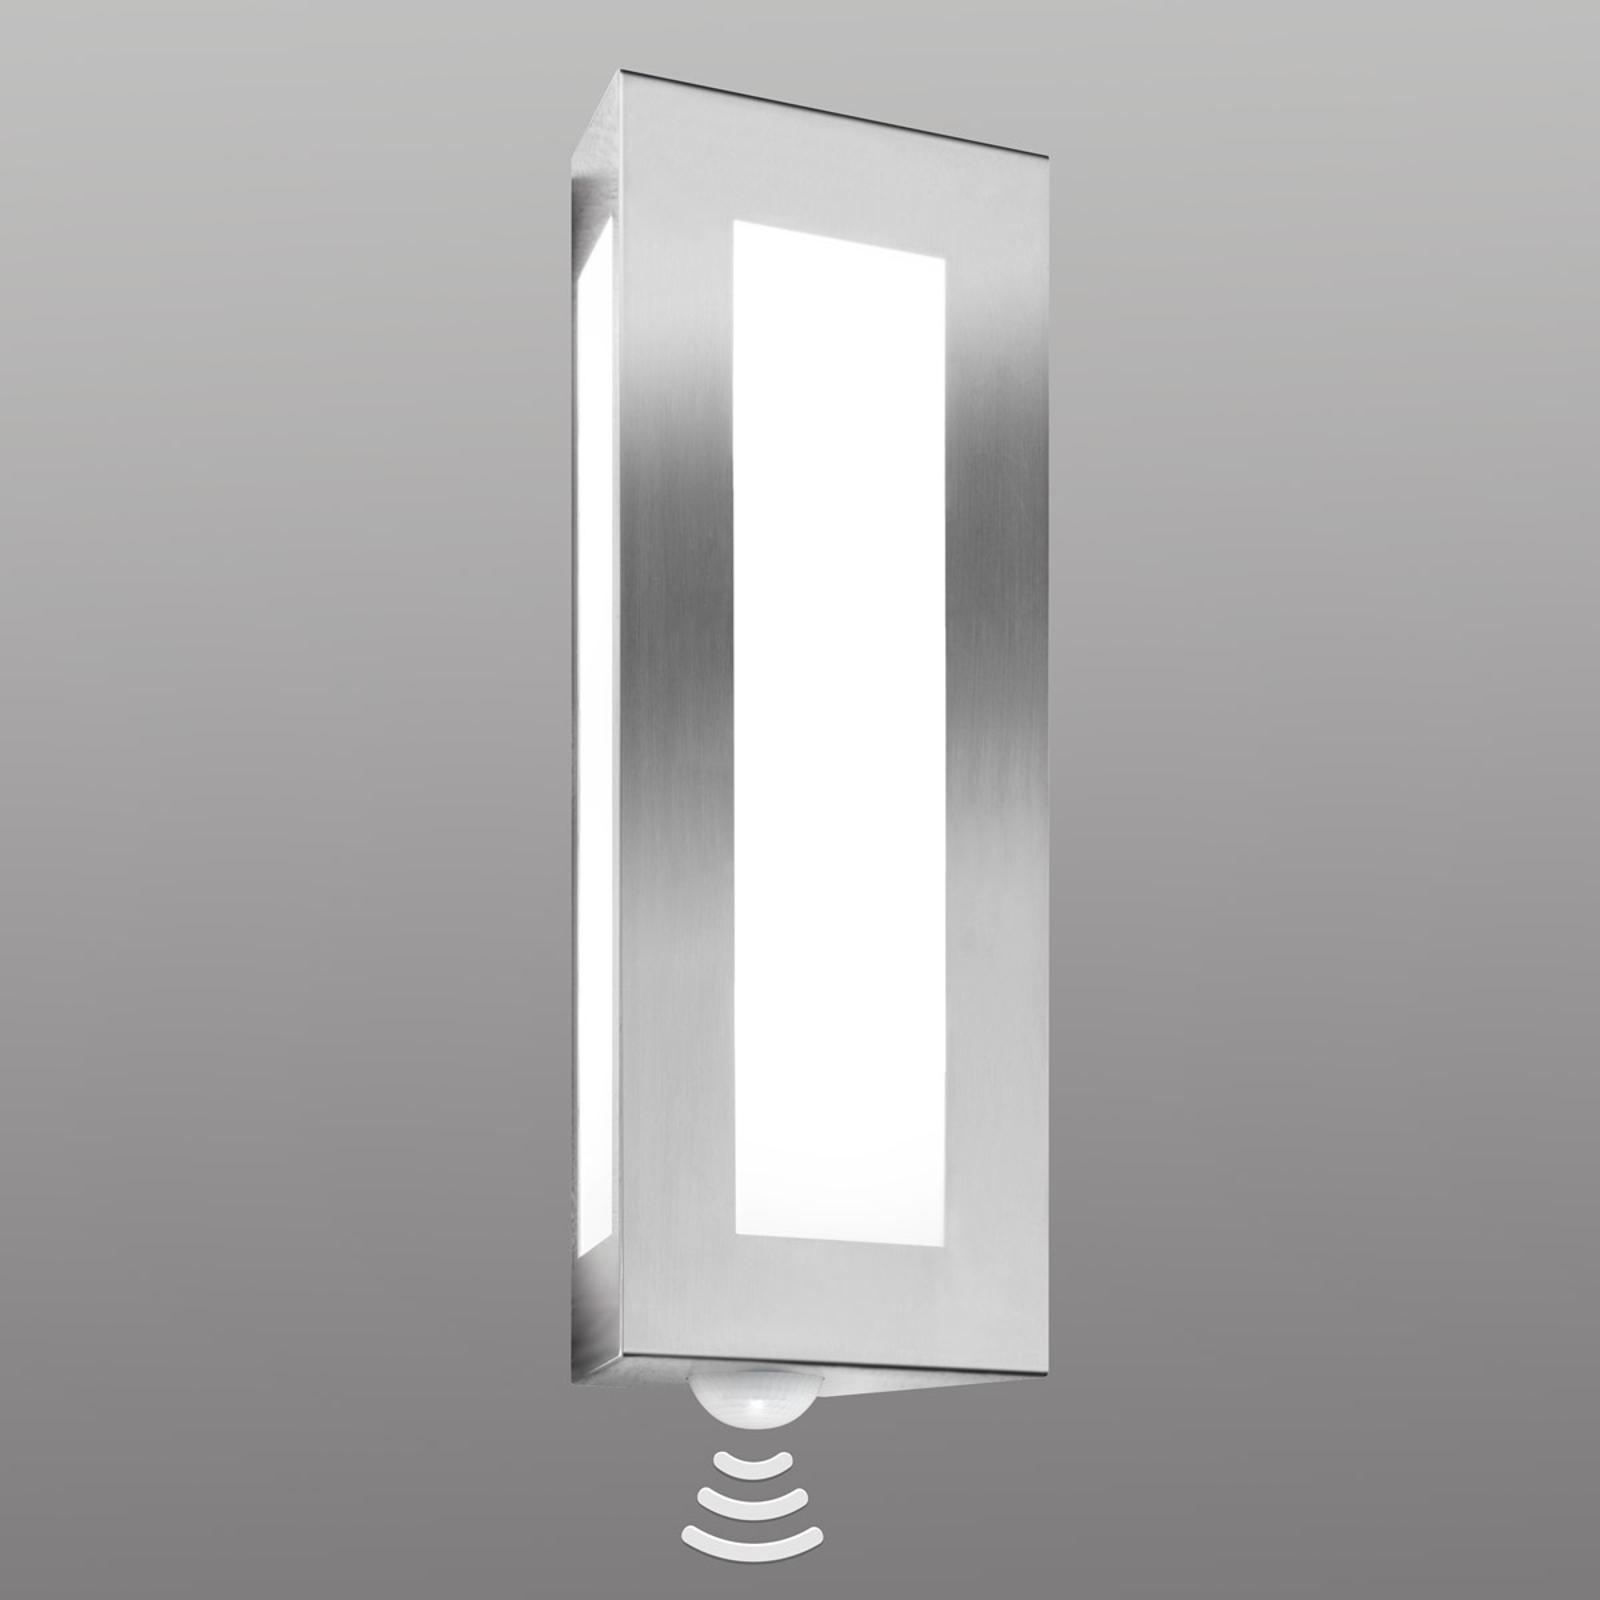 Lampada parete esterni Lija decorativa con sensore